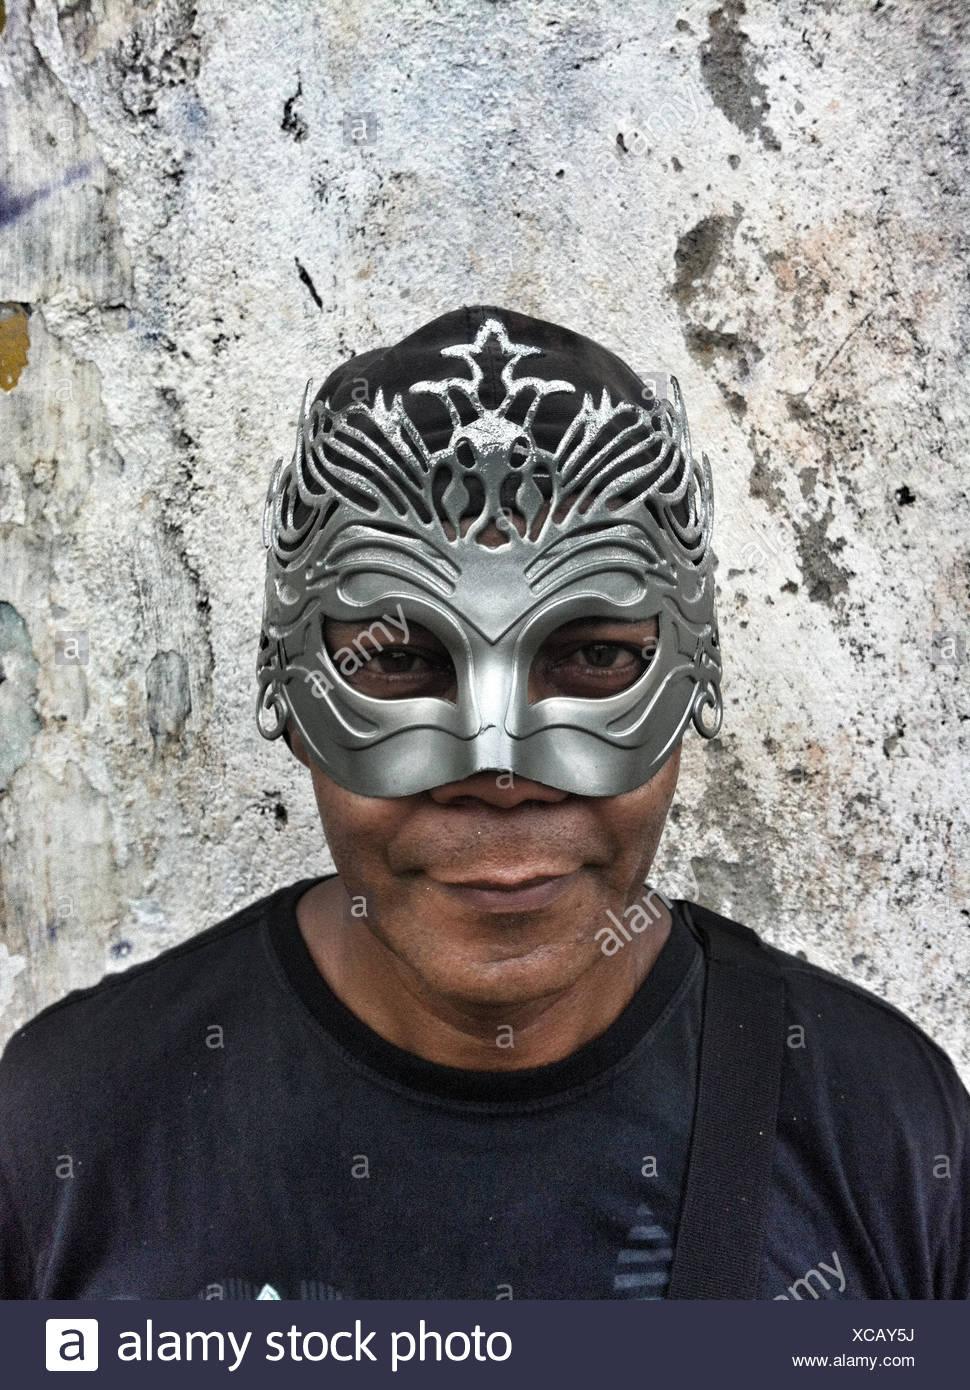 Man wearing mask at carnival, Rio de Janeiro, Brazil - Stock Image